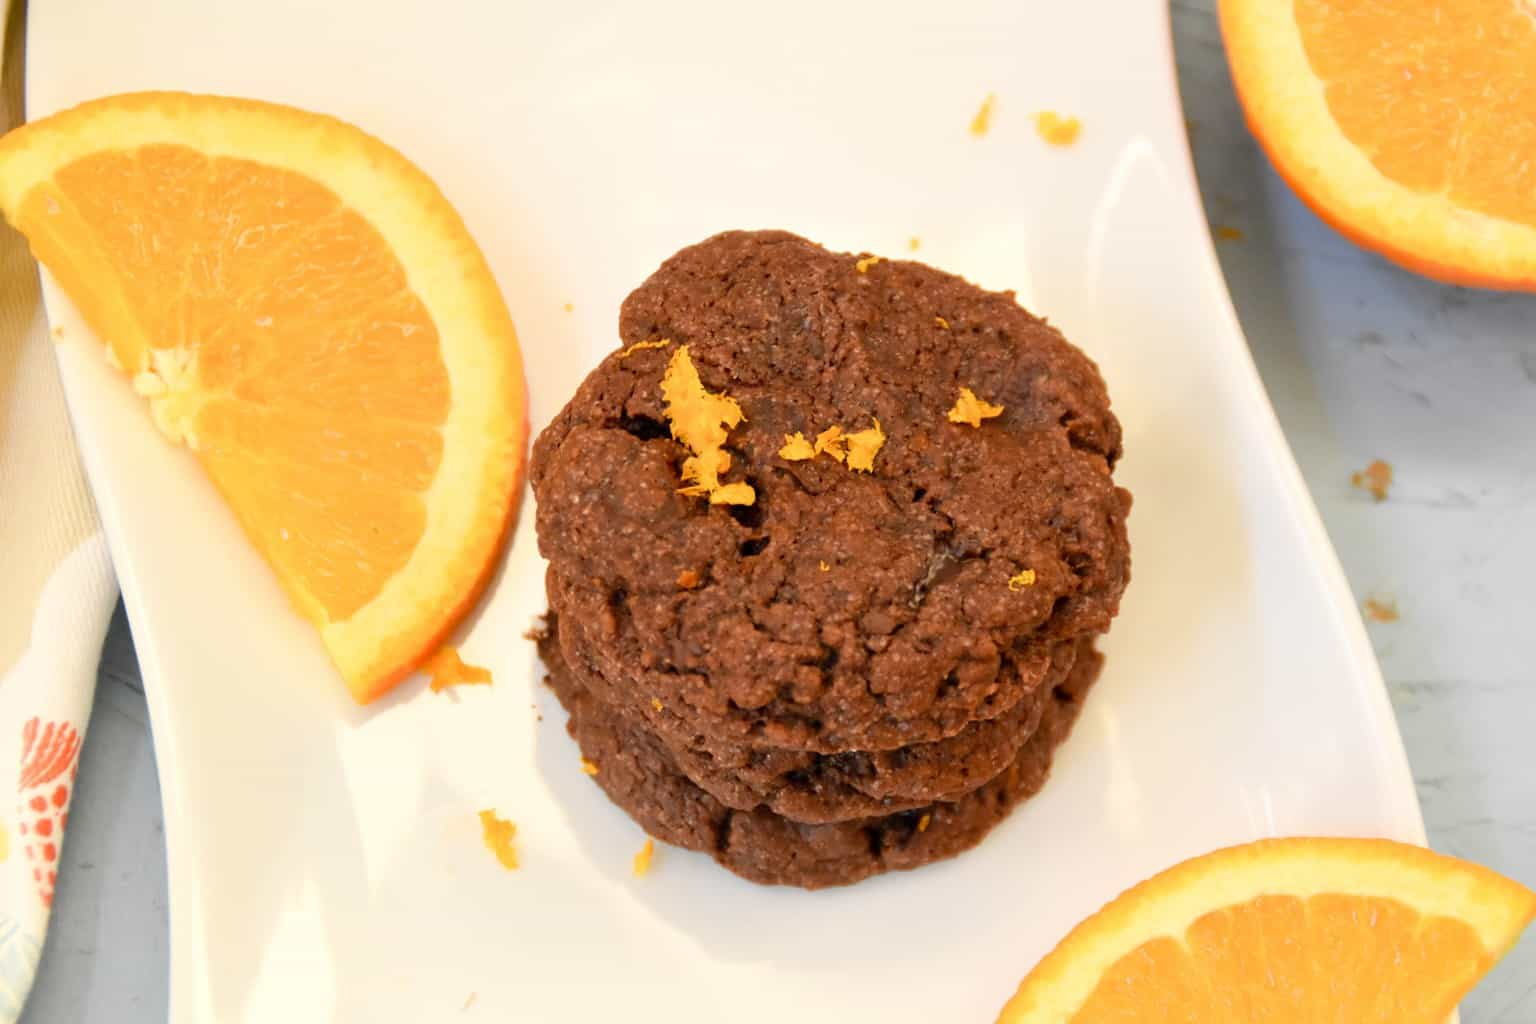 "<img src=""https://cdn.shortpixel.ai/client/q_glossy,ret_img,w_4096,h_2730/Vegan double chocolate orange cookies.jpg"" alt=""Vegan double chocolate orange cookies2"">"